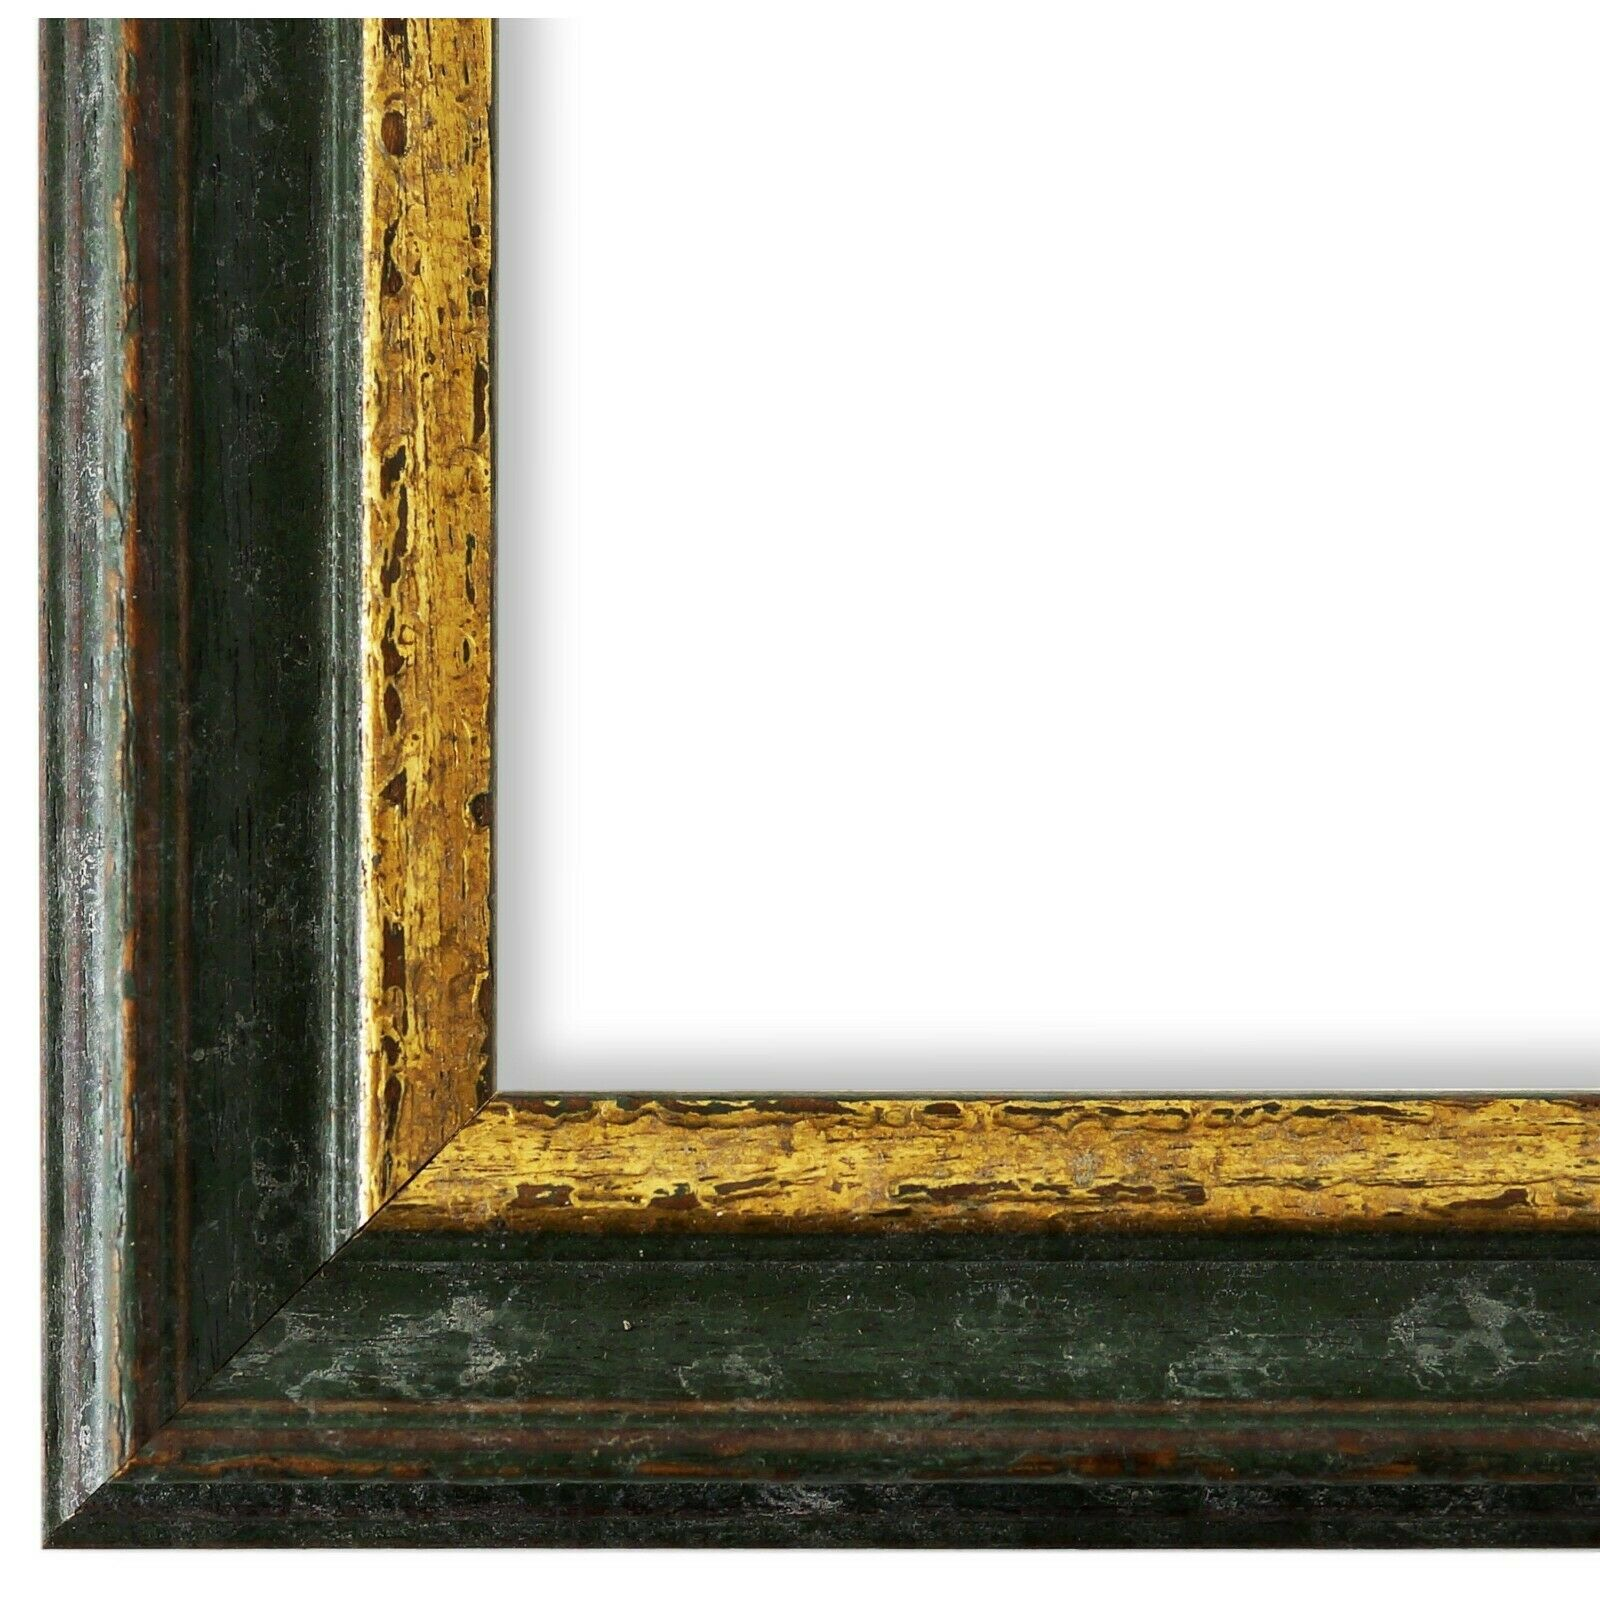 Bilderrahmen Rahmen Grün Gold Vintage Retro Holz Forli 3,7 - NEU alle Größen